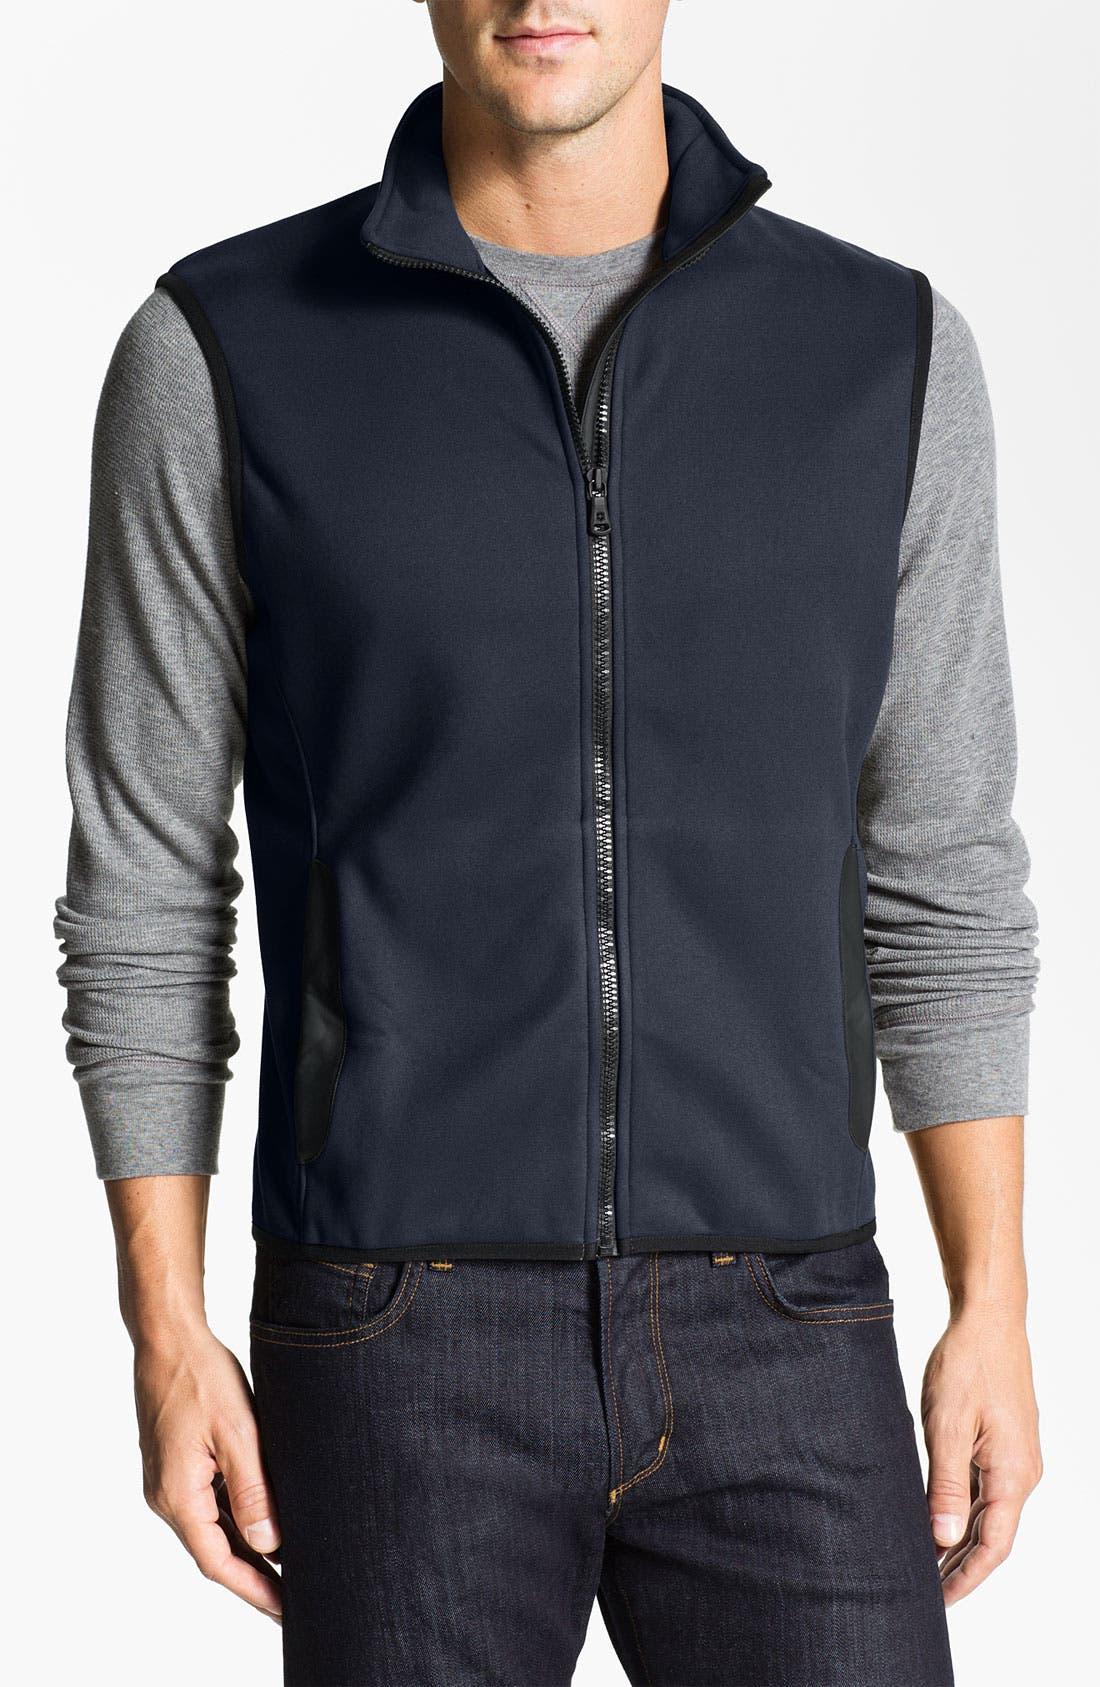 Main Image - Victorinox Swiss Army® 'Base' Fleece Vest (Online Exclusive)